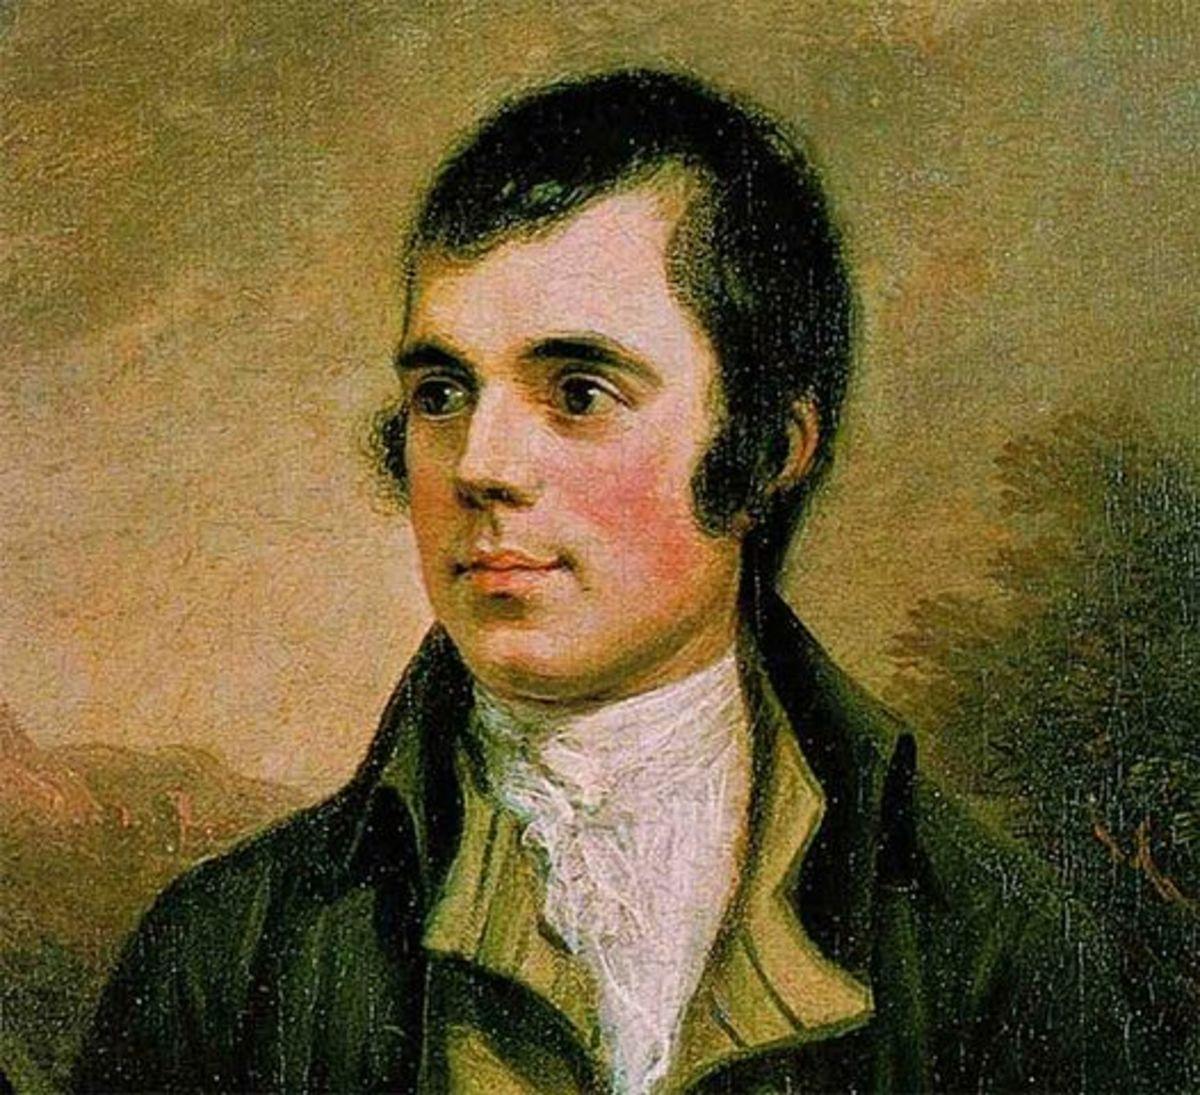 Tam O'Shanter: a poem by Robert Burns